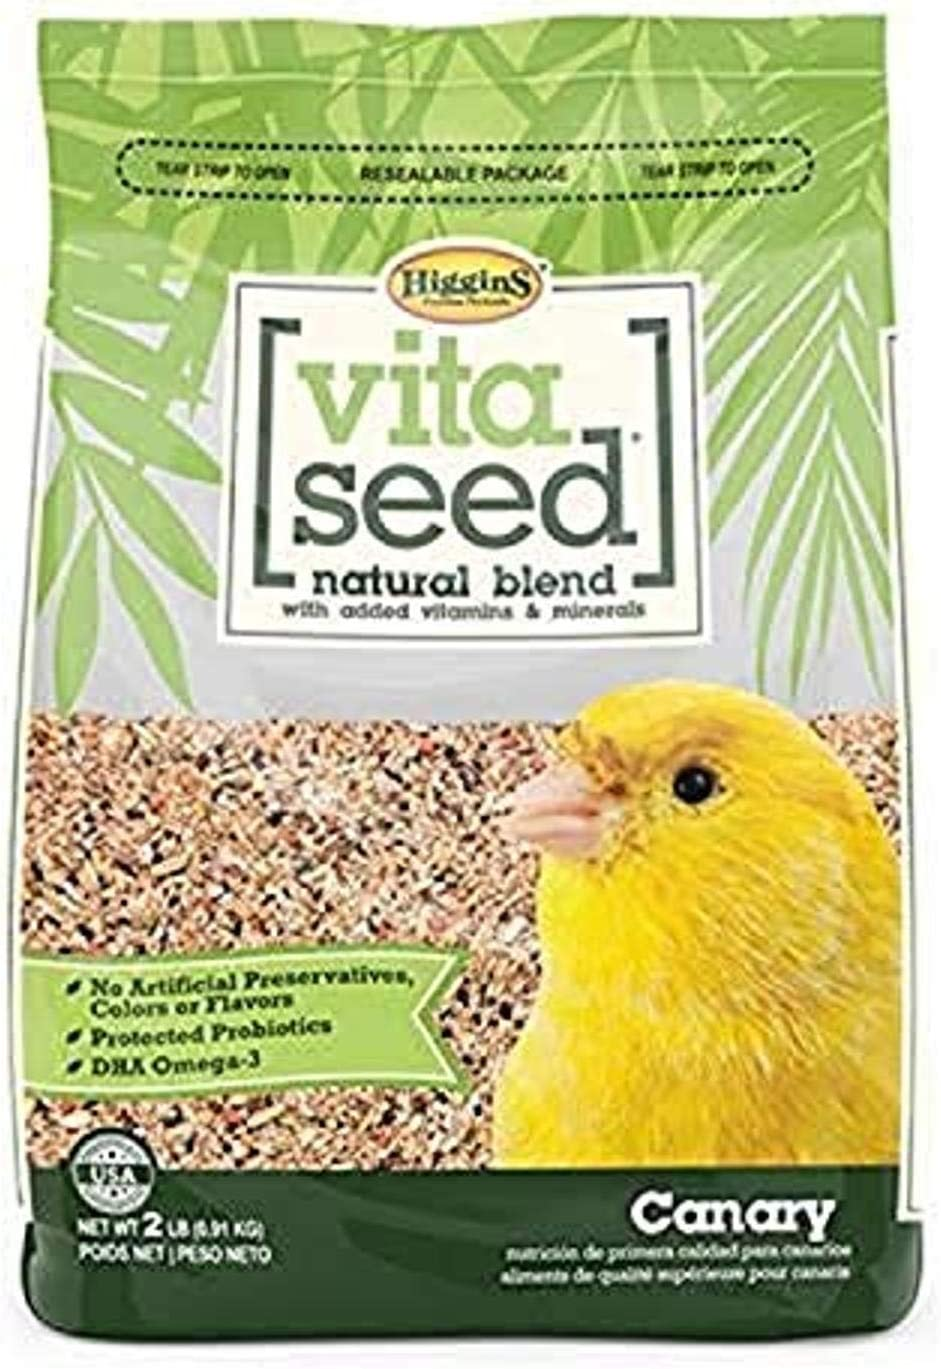 Higgins Vita Seed Canary 2 Lb